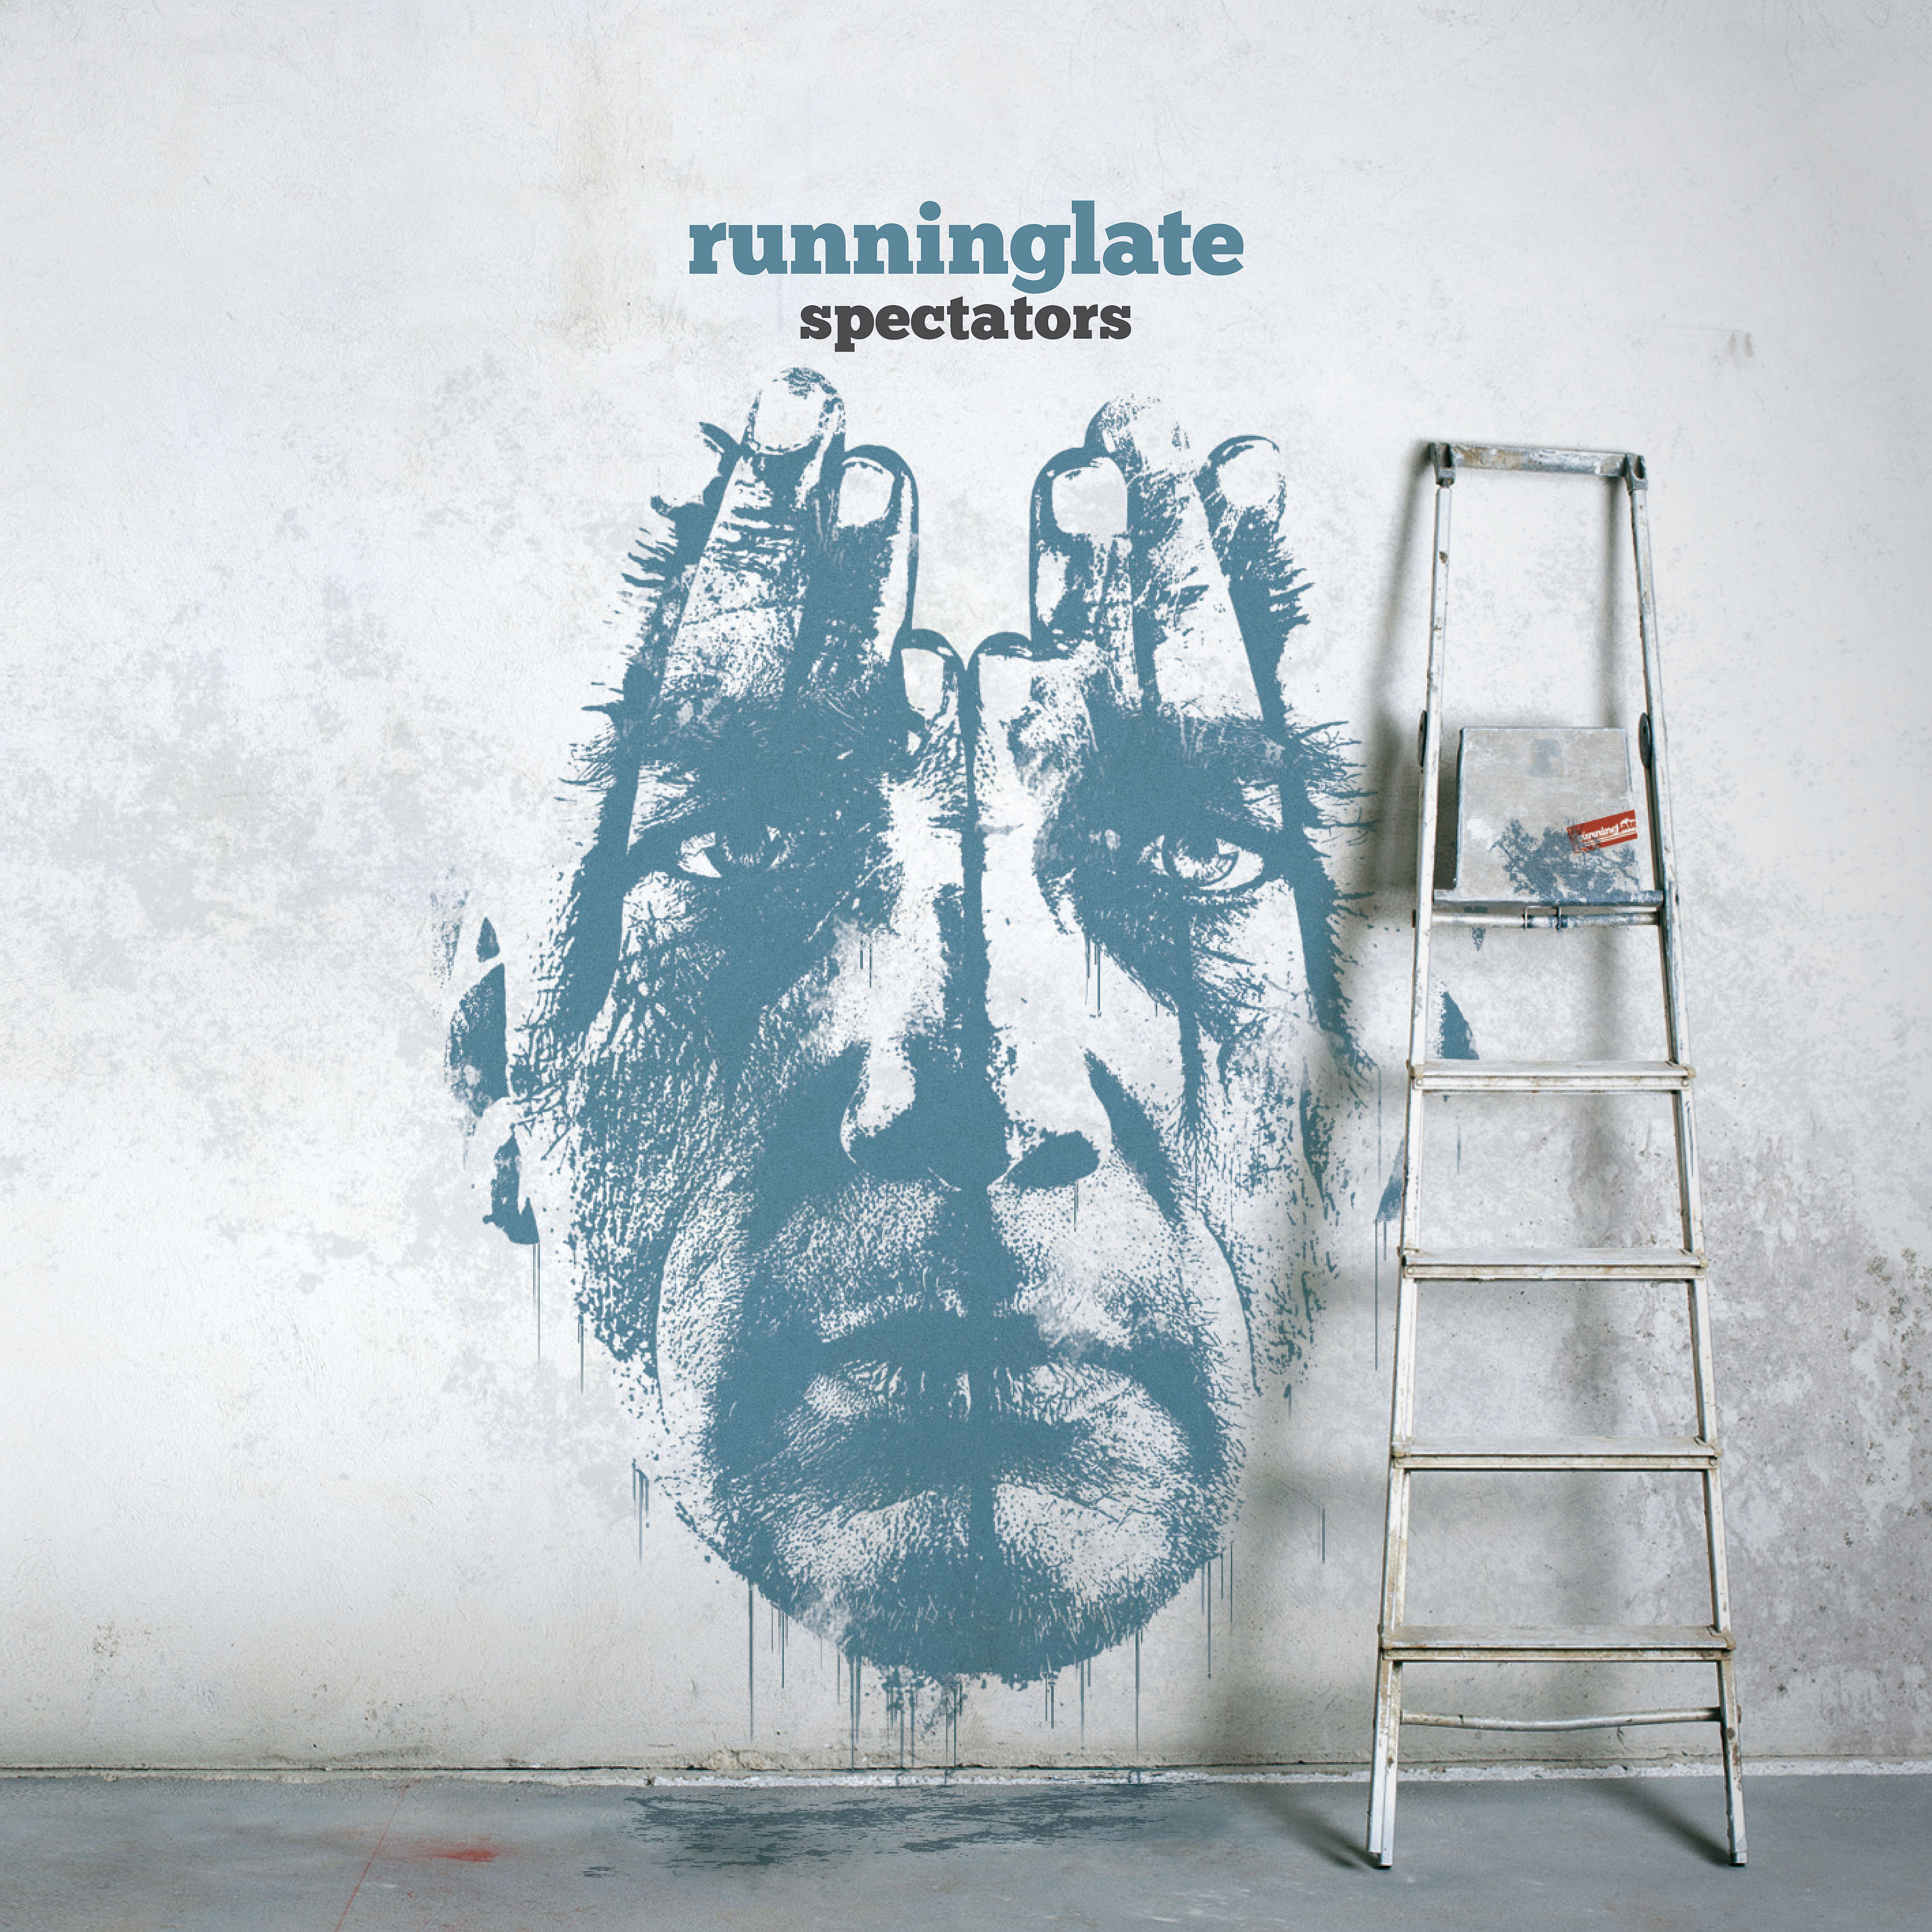 RunningLate – Spectators